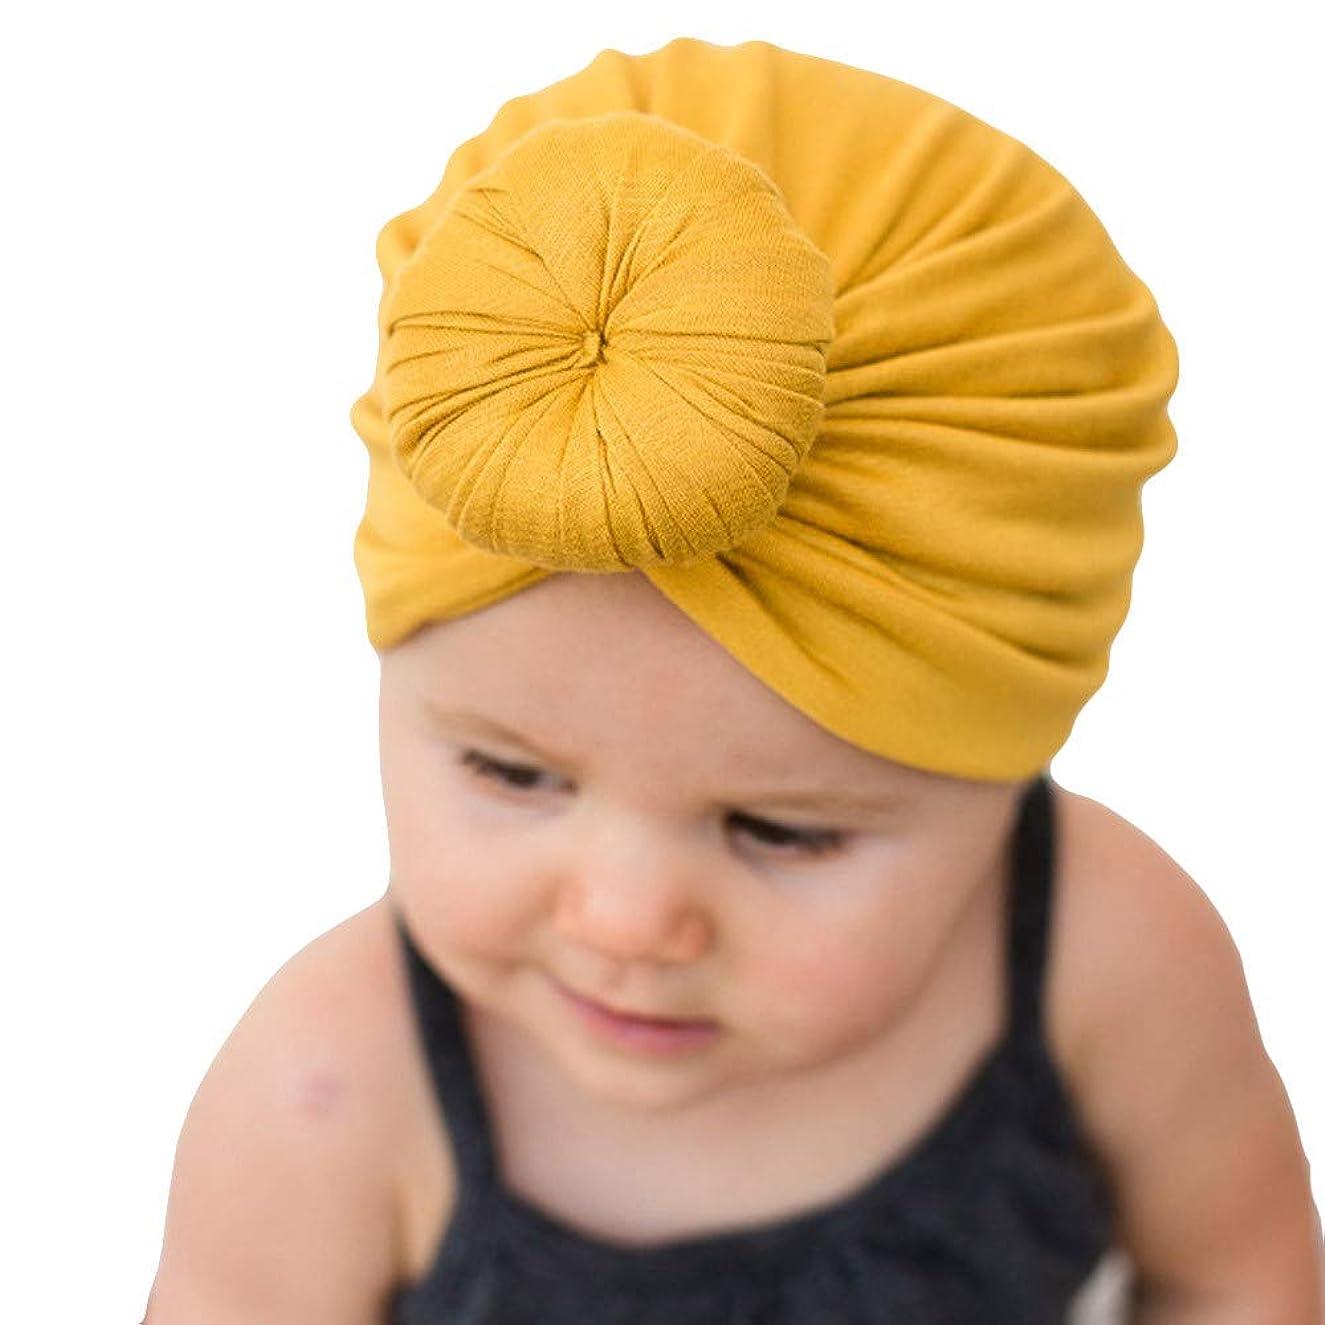 JESPER Newborn Cute Lovely Soft Cute Hat Bow Baby Girl Hospital Beanie Hat